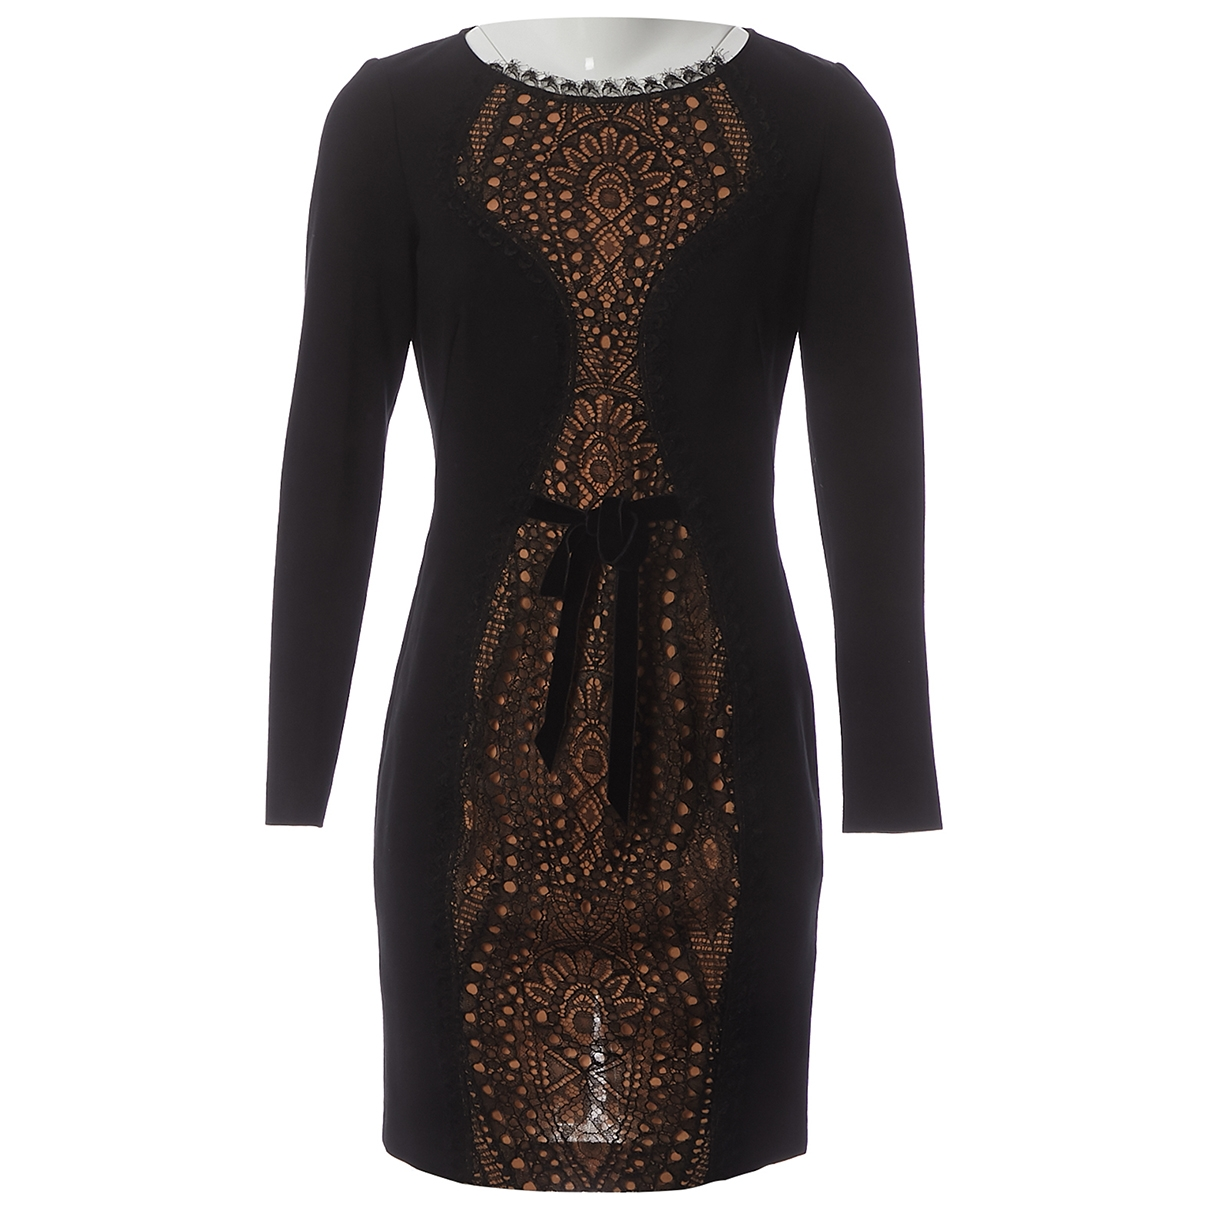 Emilio Pucci \N Black dress for Women 42 IT